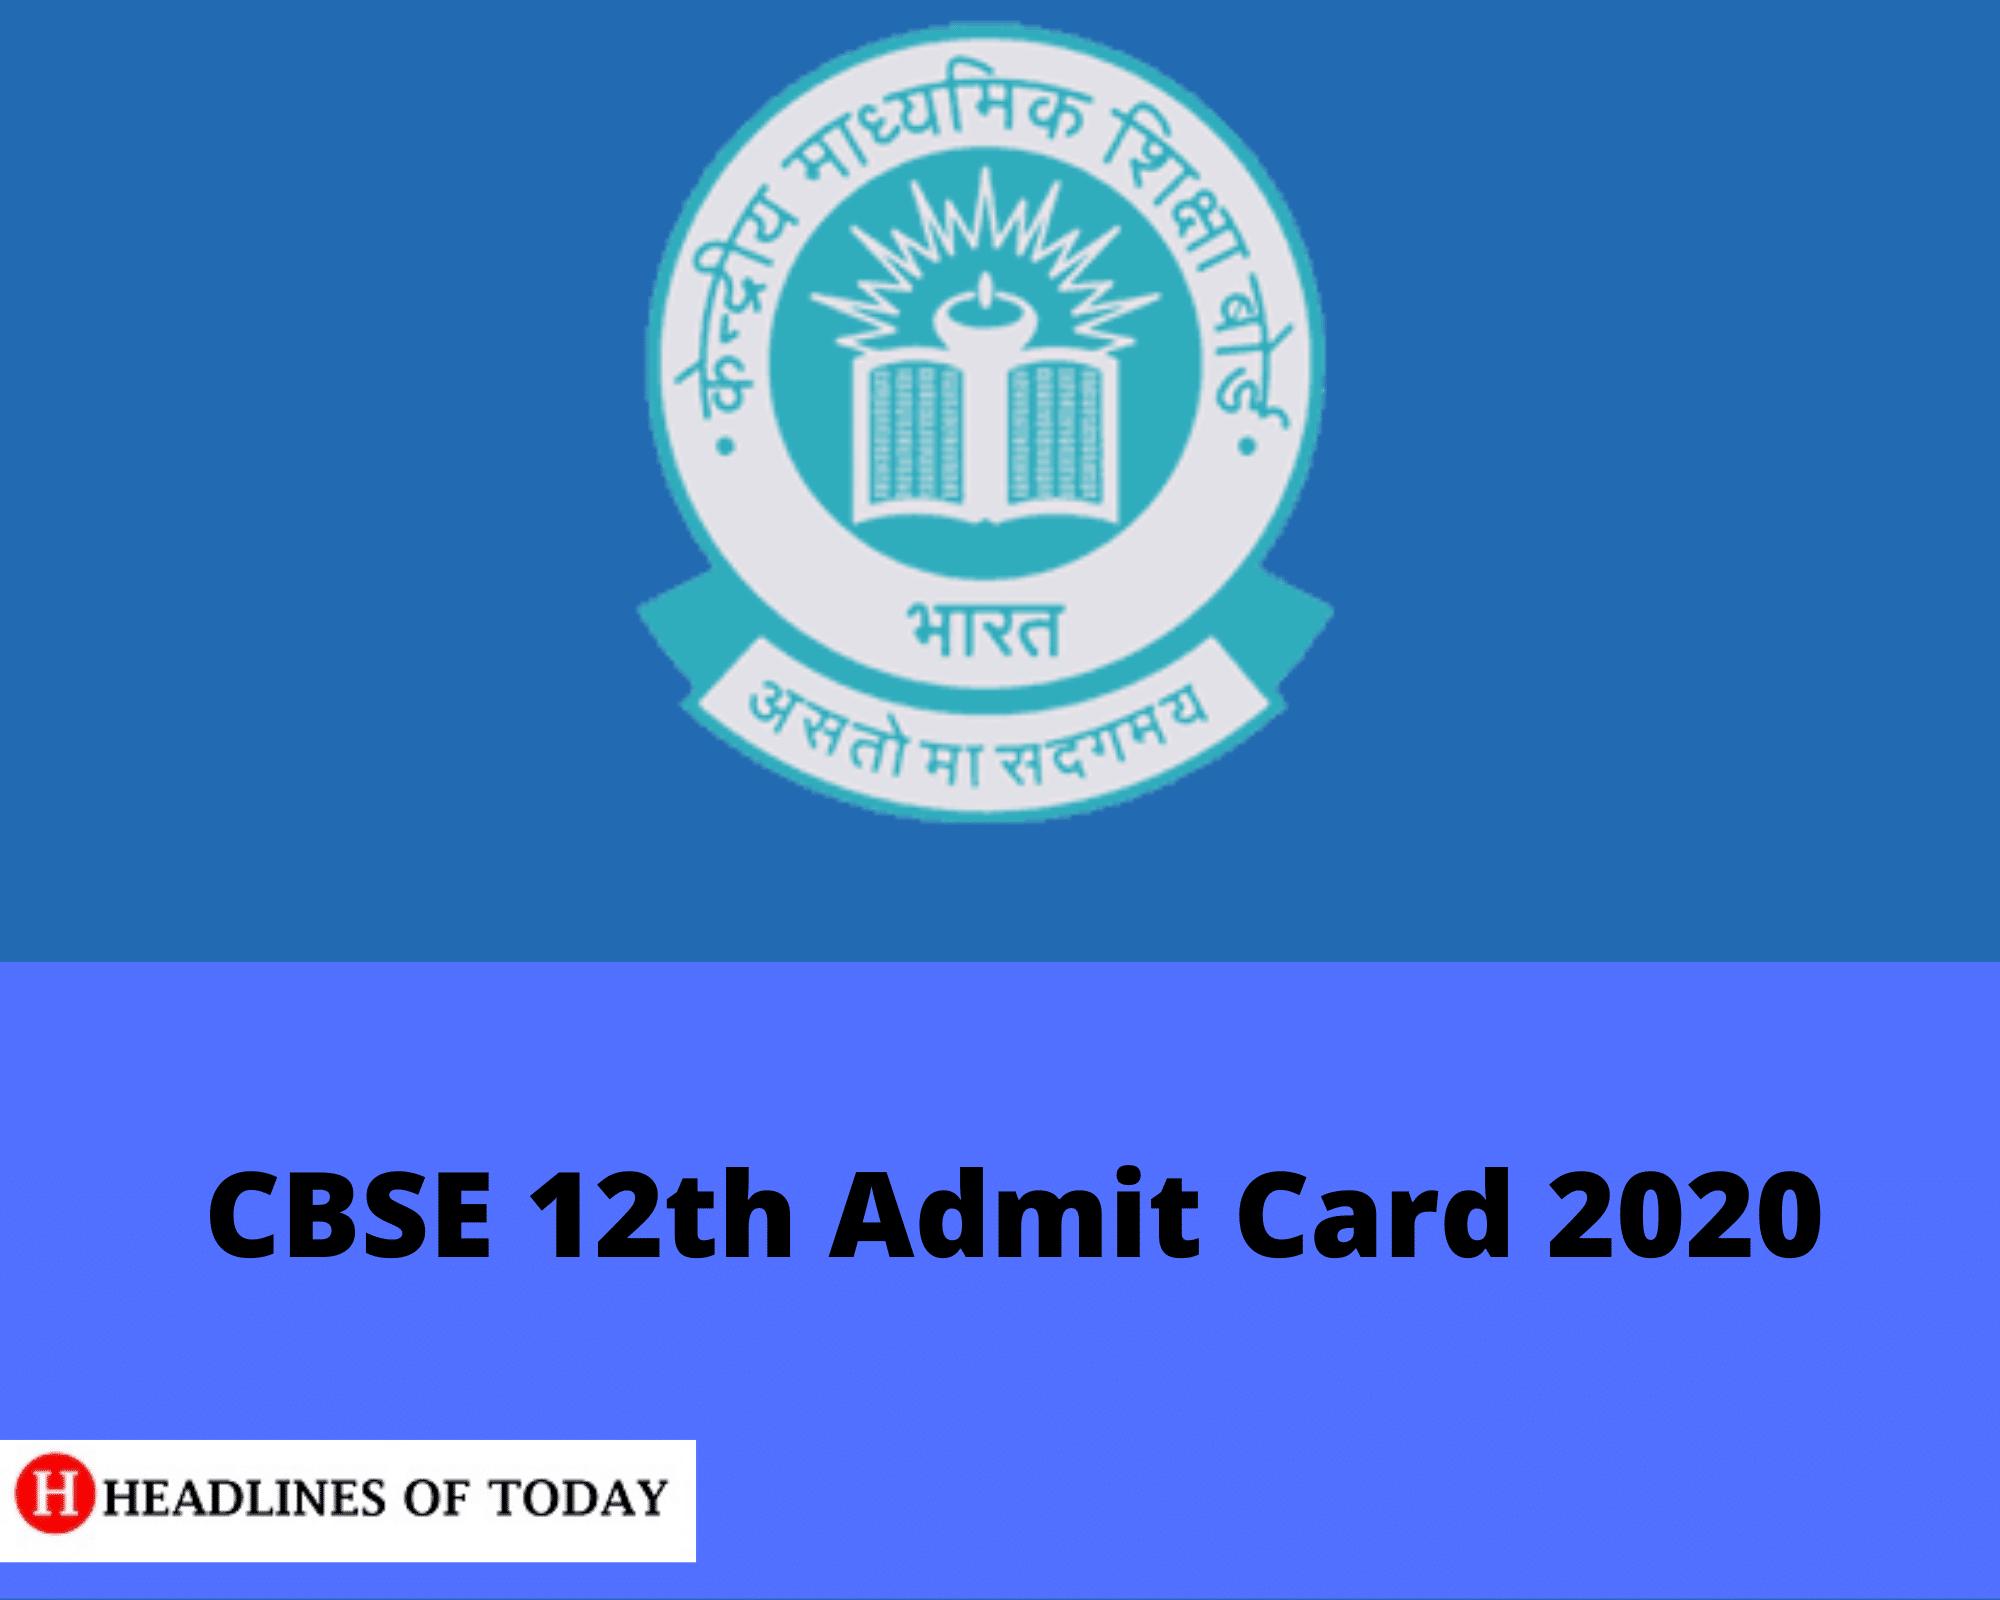 CBSE Class 12 Admit Card 2020